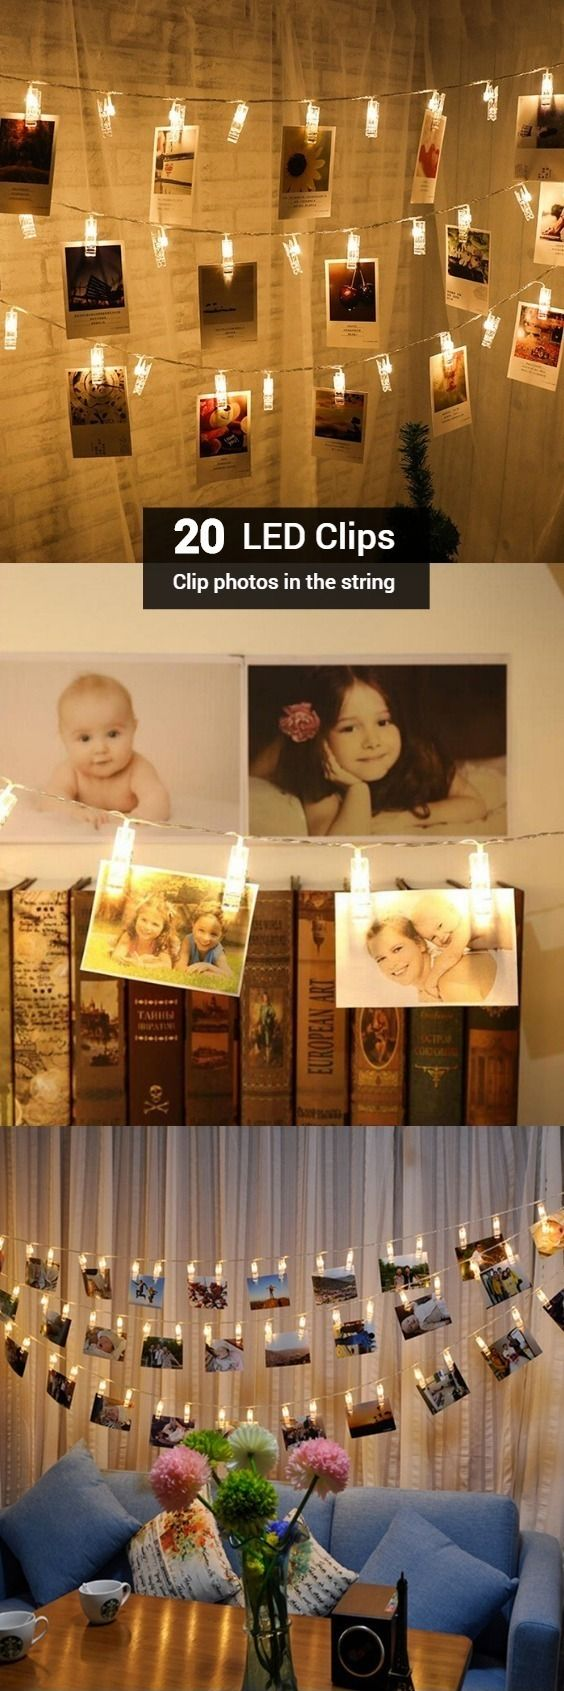 LED 20pc-clip Light String Warm White Lights Decorative Lights #valentinesday